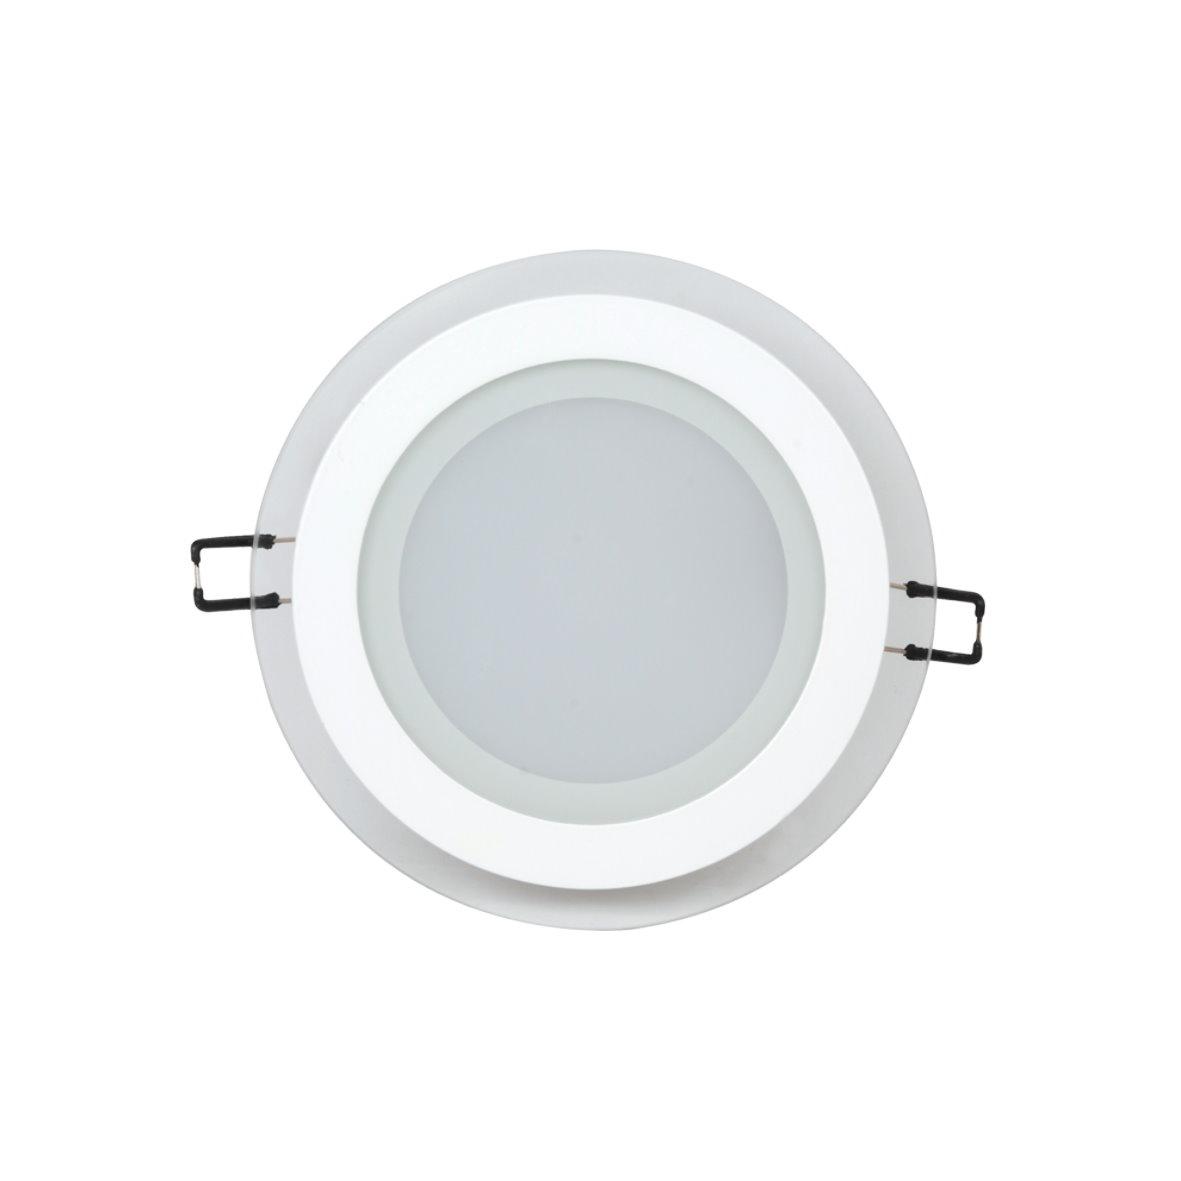 led aluminium einbaustrahler kristallglas mit trafo 230v 6w 12w 15w bis 1200lm. Black Bedroom Furniture Sets. Home Design Ideas